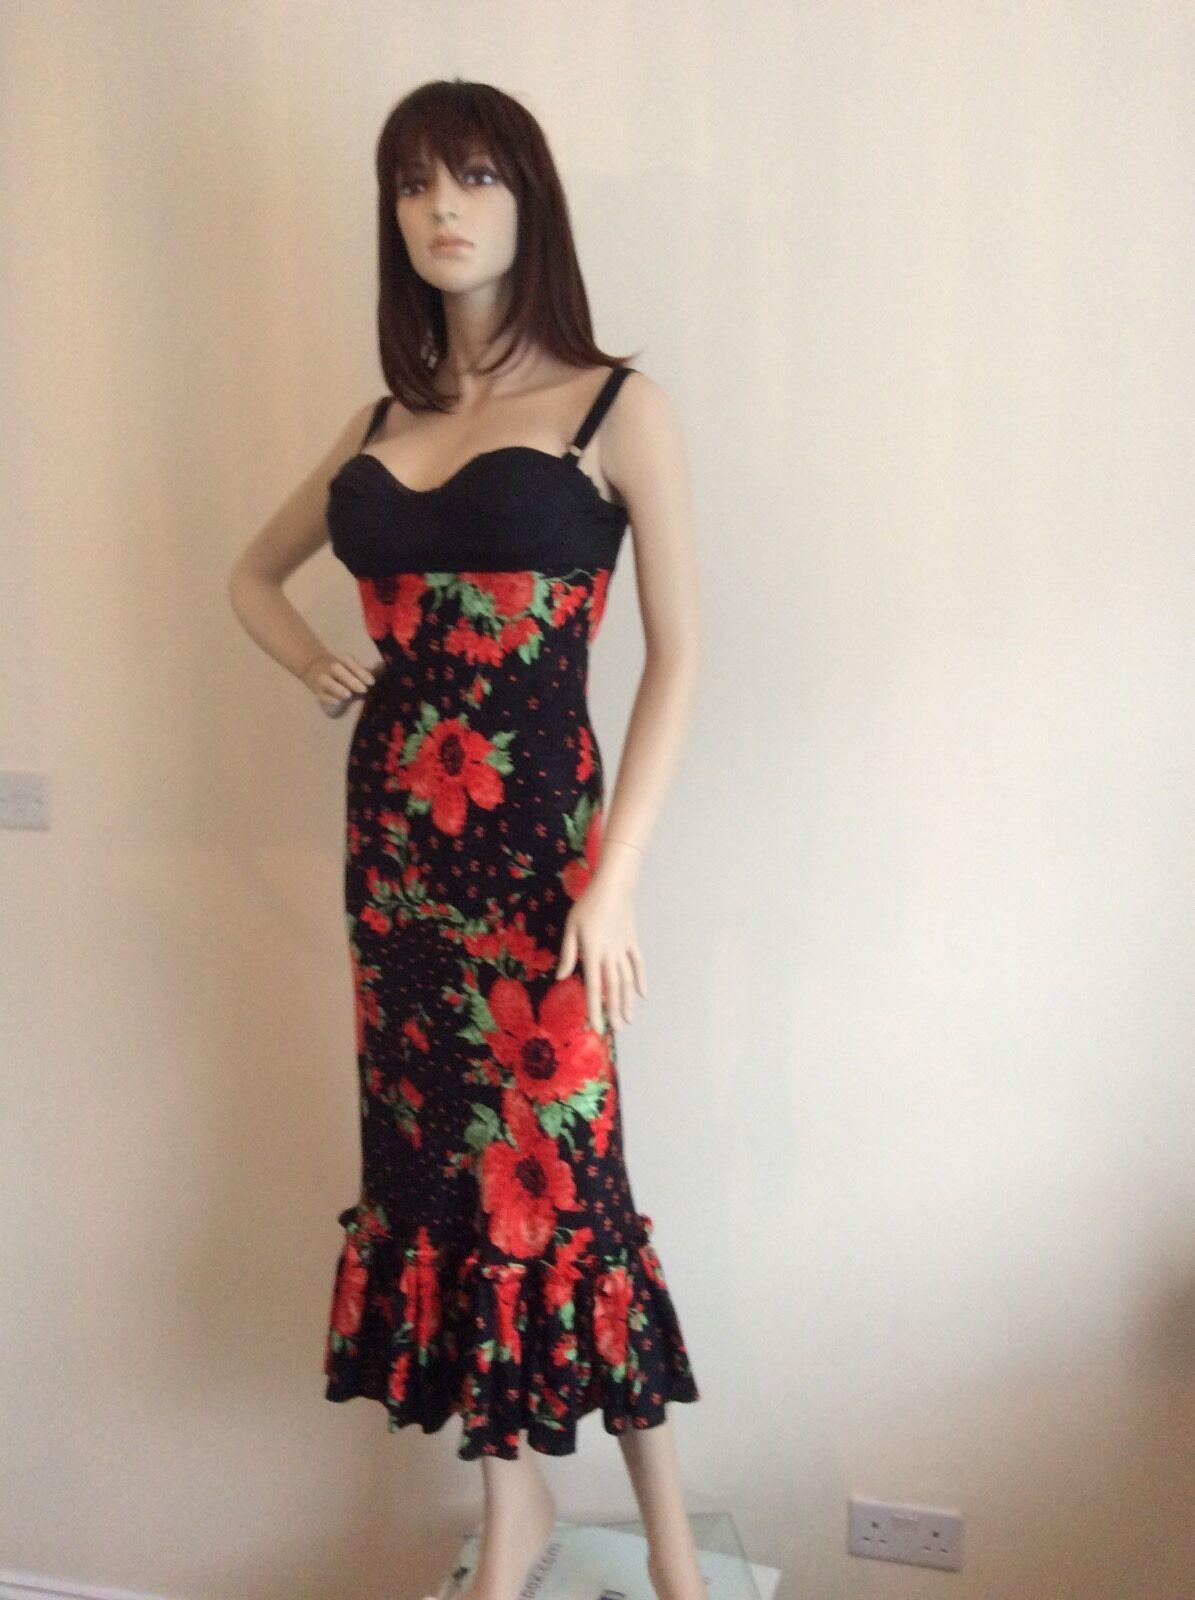 D &G Volupuos Silk Dress Storlek It42